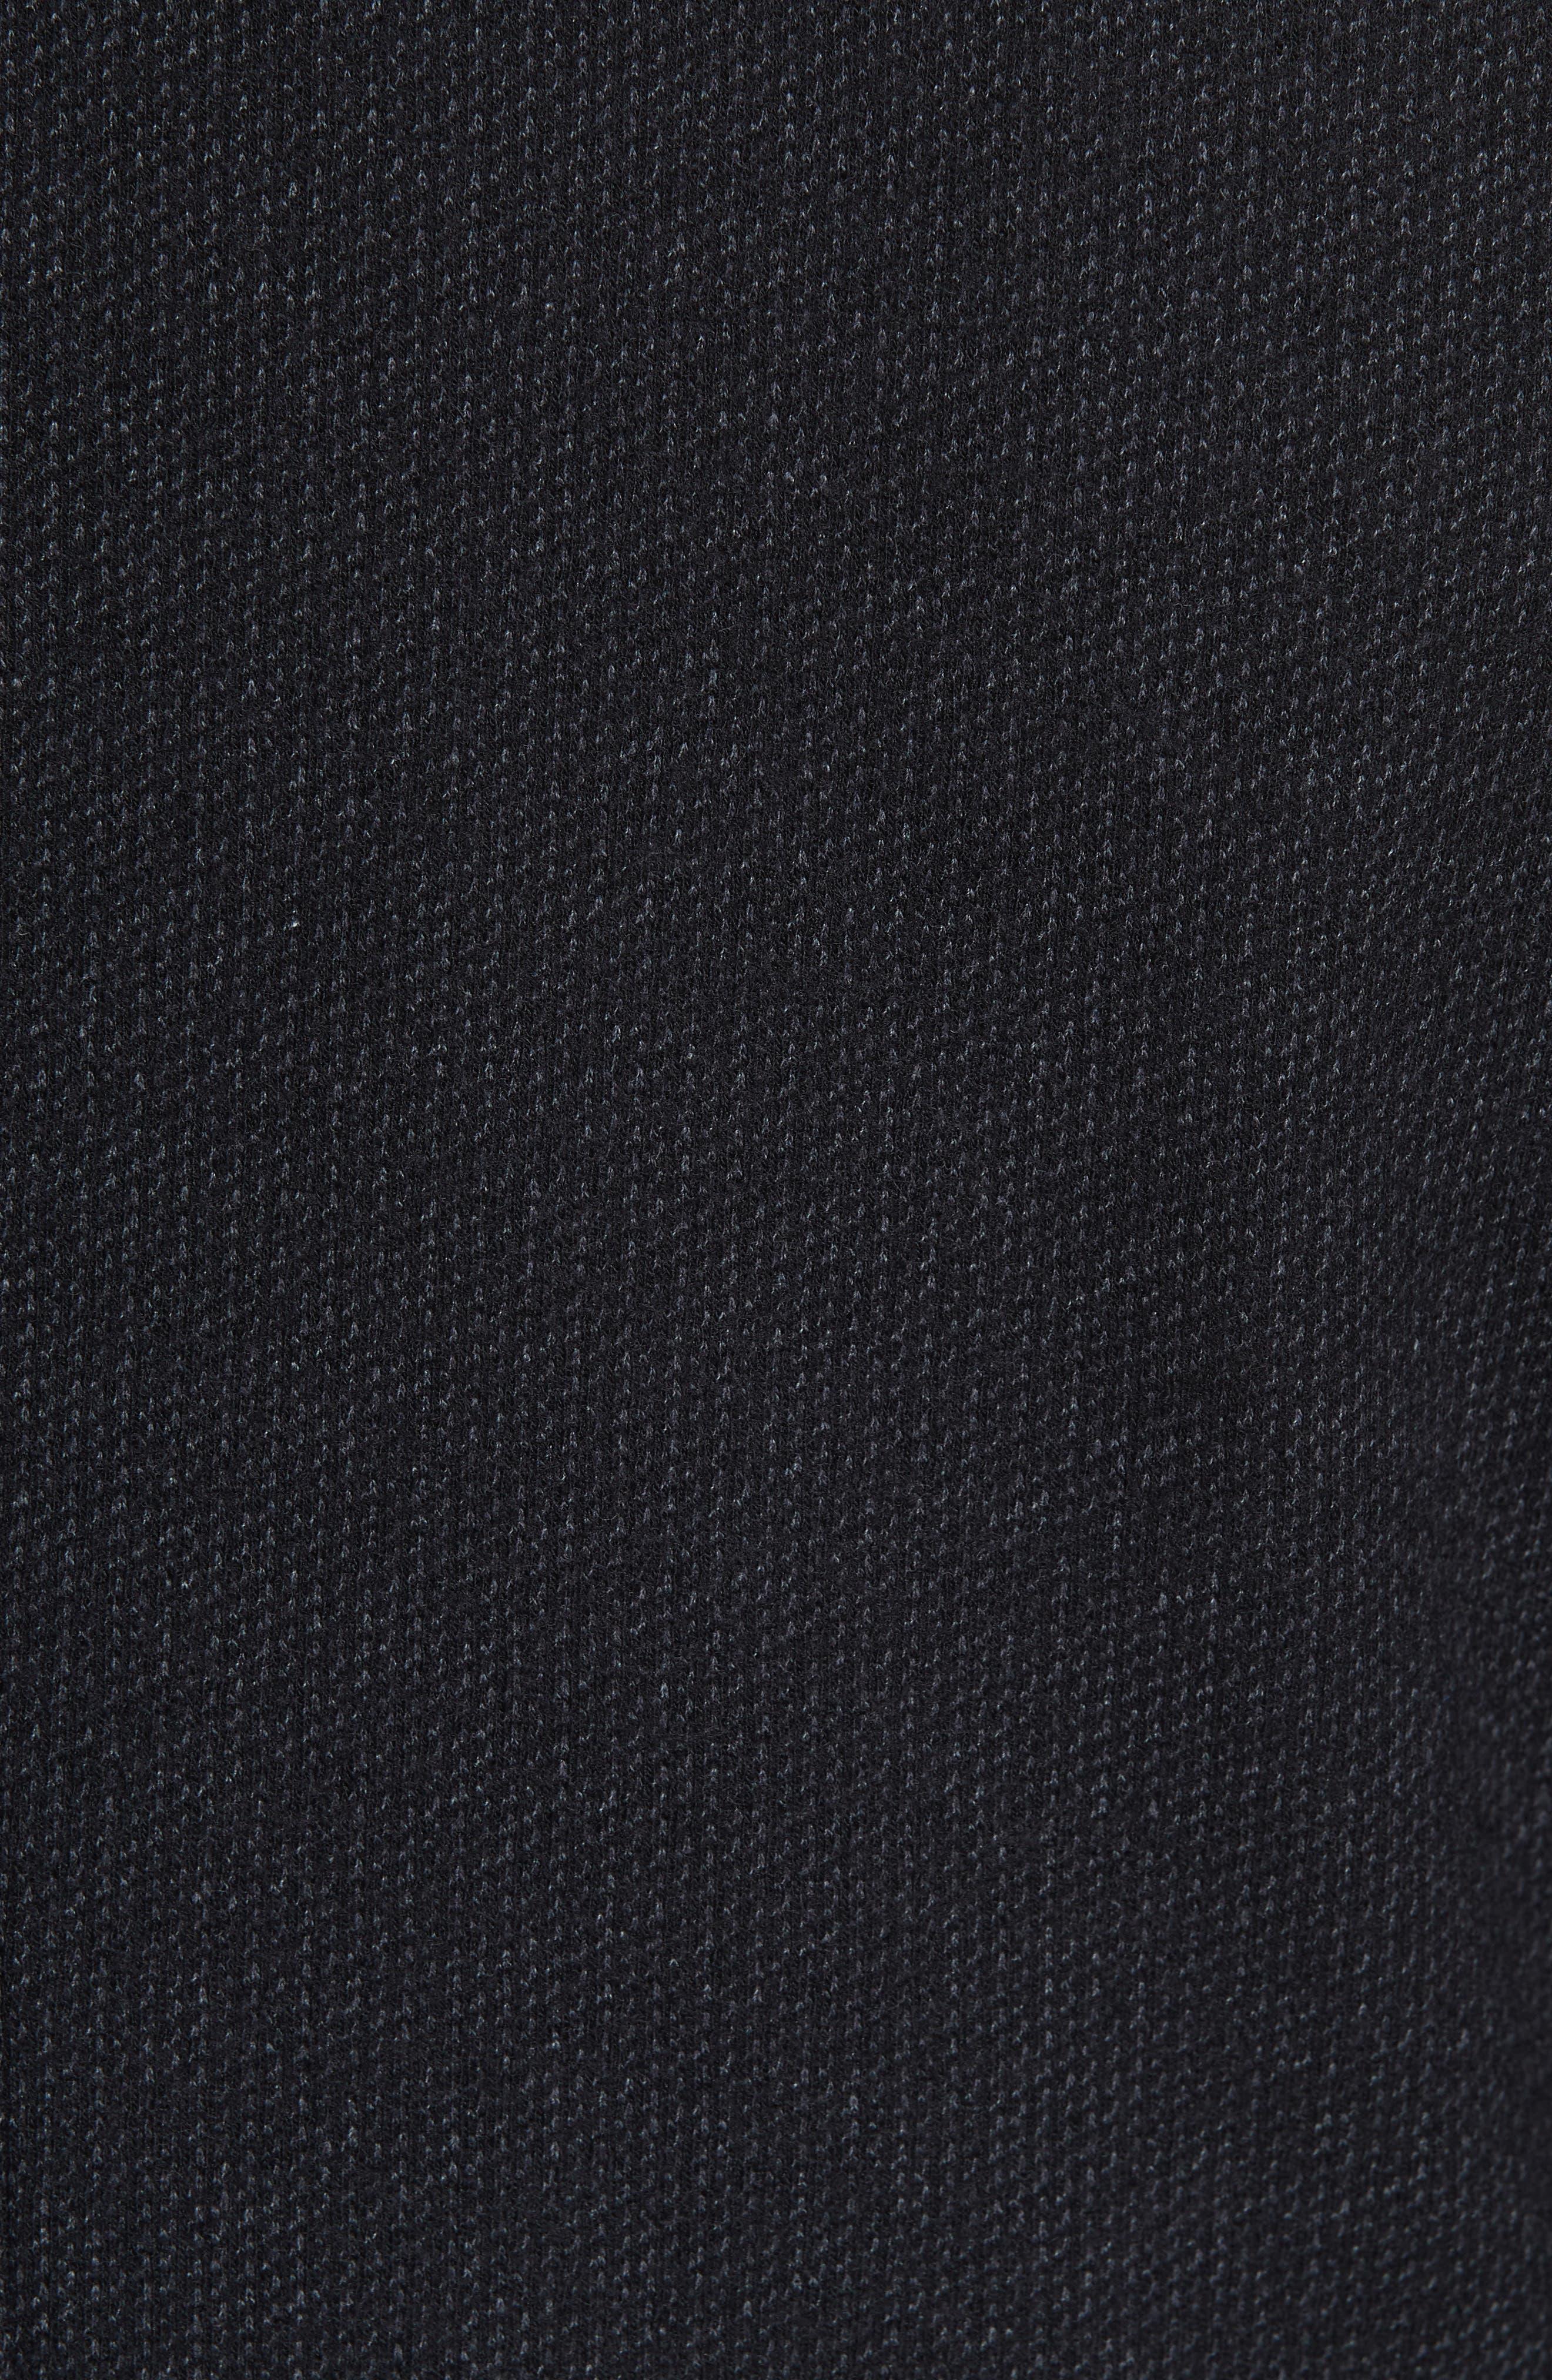 Slim Fit Wool & Cotton Blazer,                             Alternate thumbnail 6, color,                             020